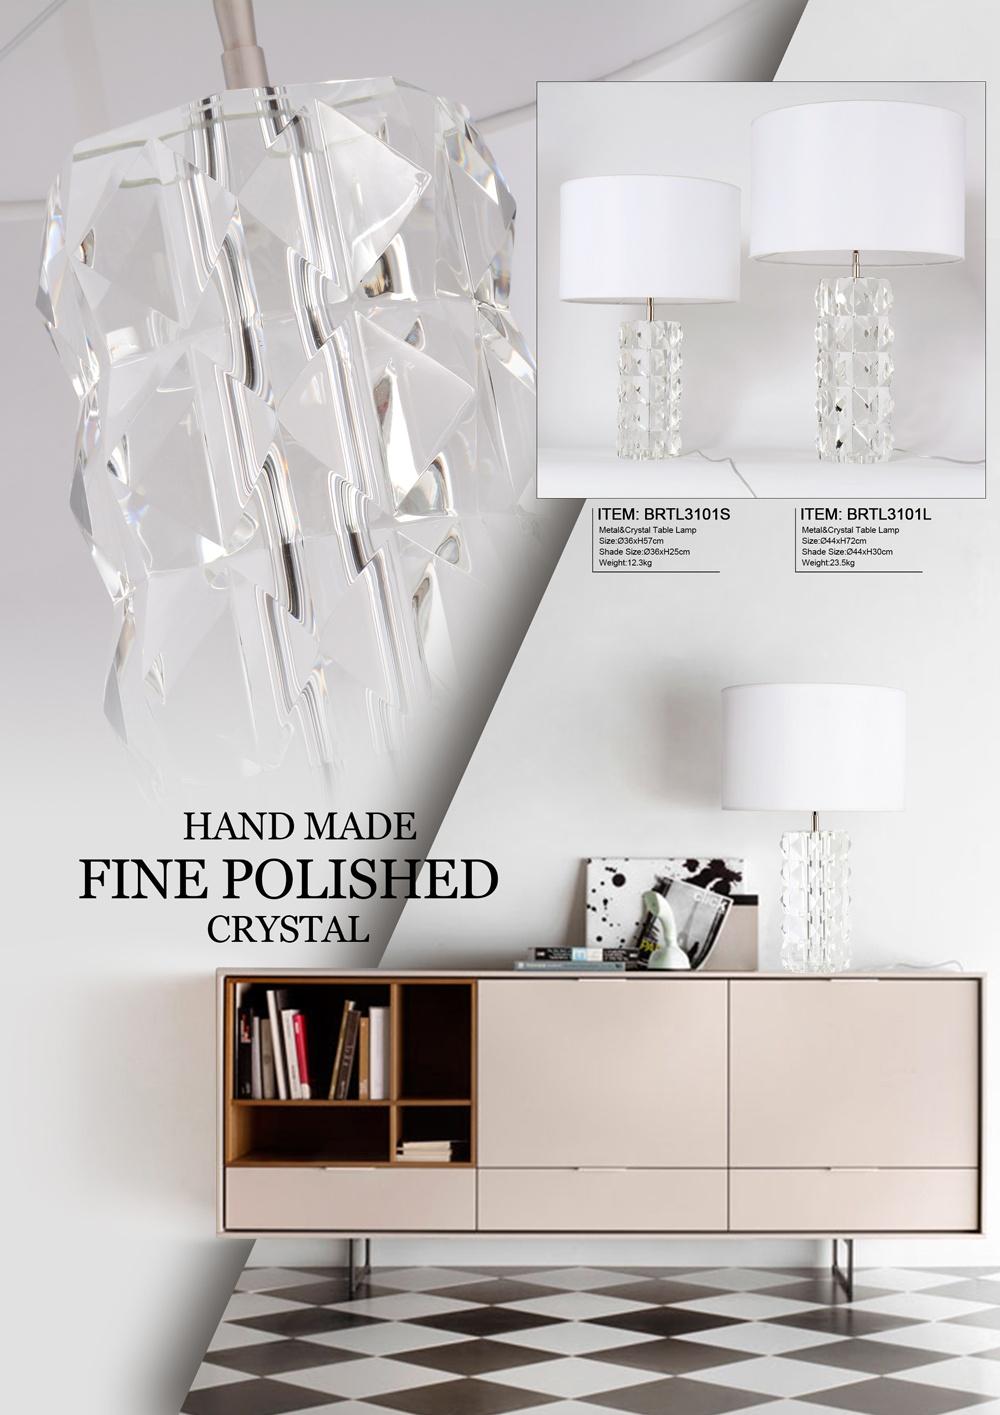 Clear Prism Table Lights Corner Column Crystal Table Lamp for Hotel Living Room Bedside High End Lamps